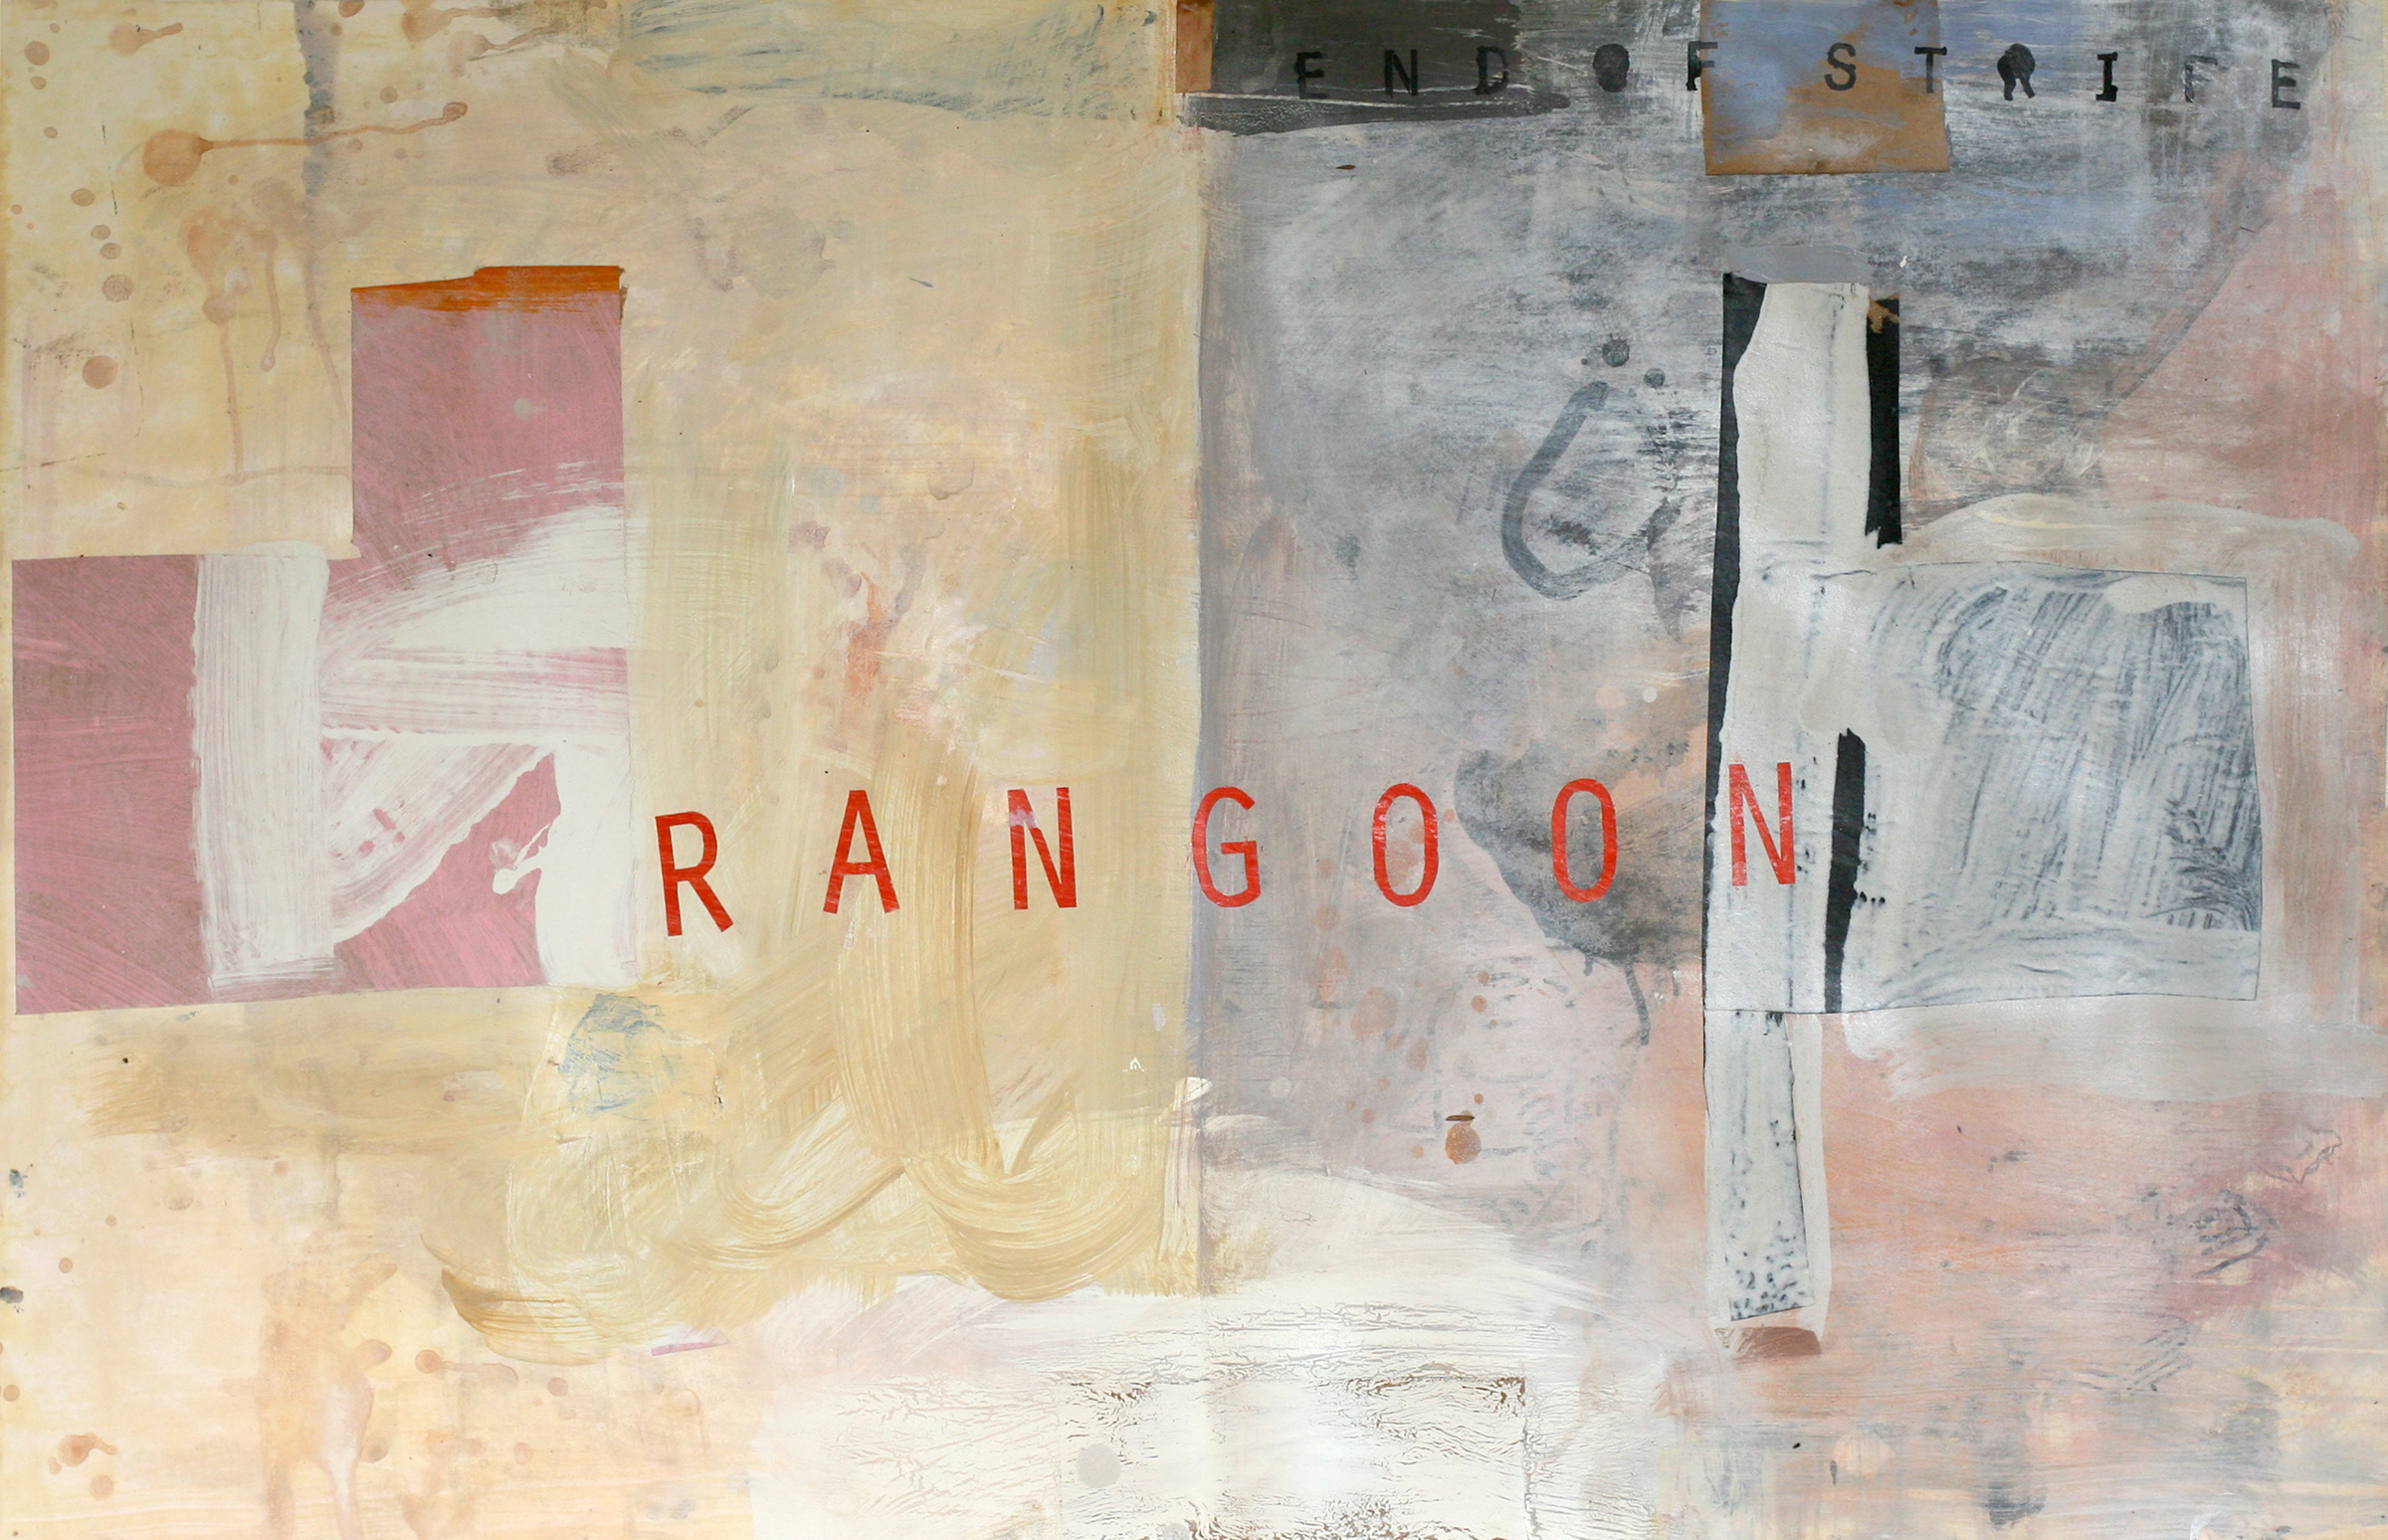 Rangoon, acrylic and paste on paper